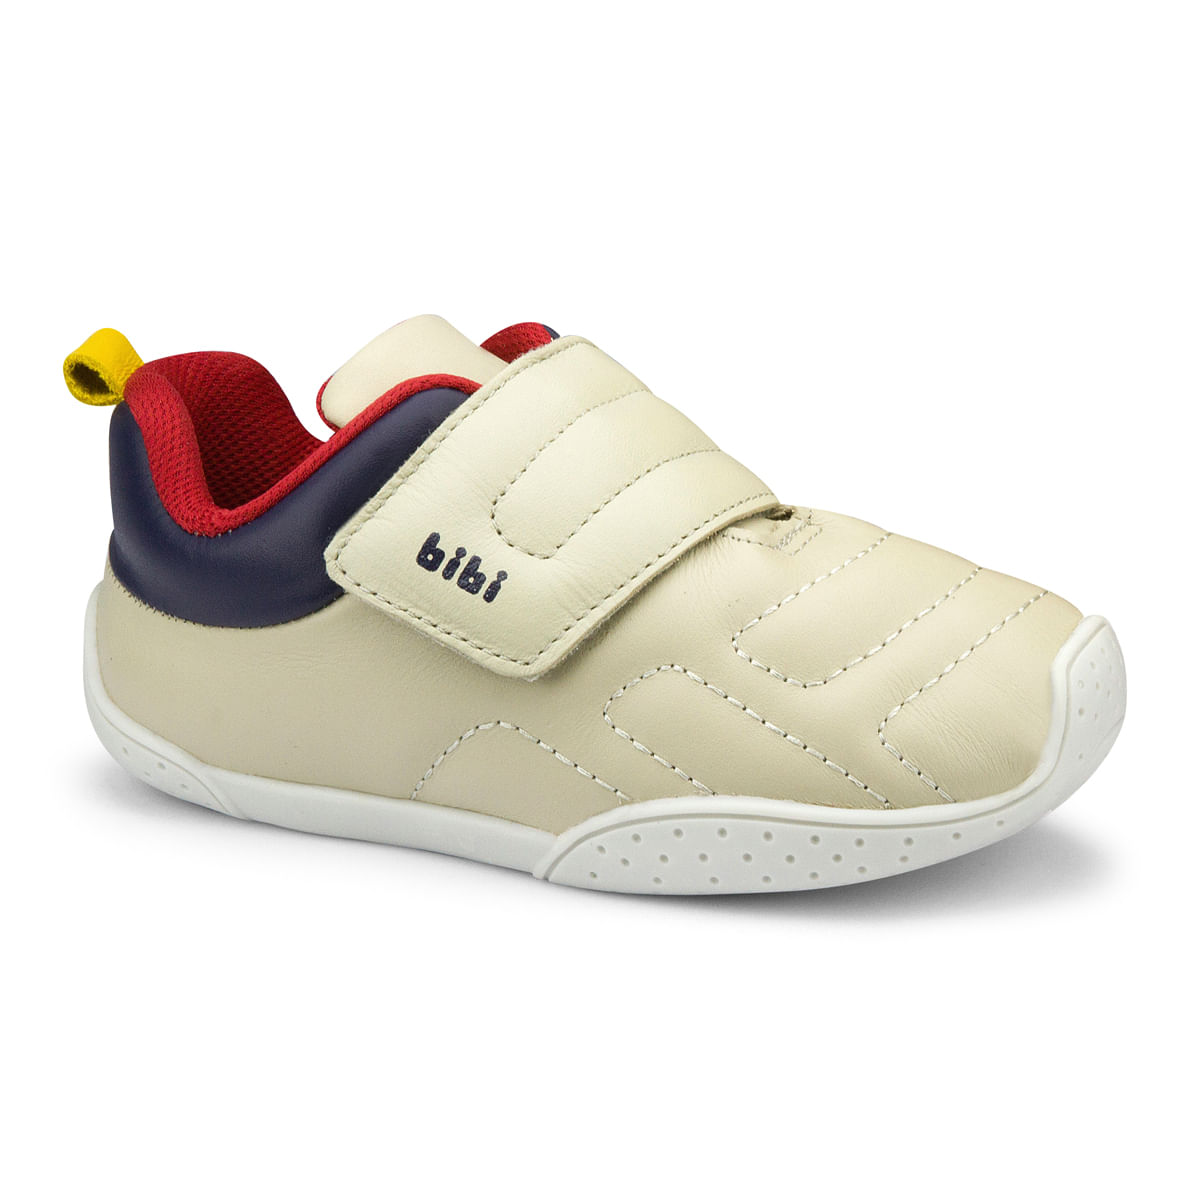 30cb4cf3d Tênis Infantil Bibi Masculino Gelo Fisioflex 1063080 - Bibi Calçados